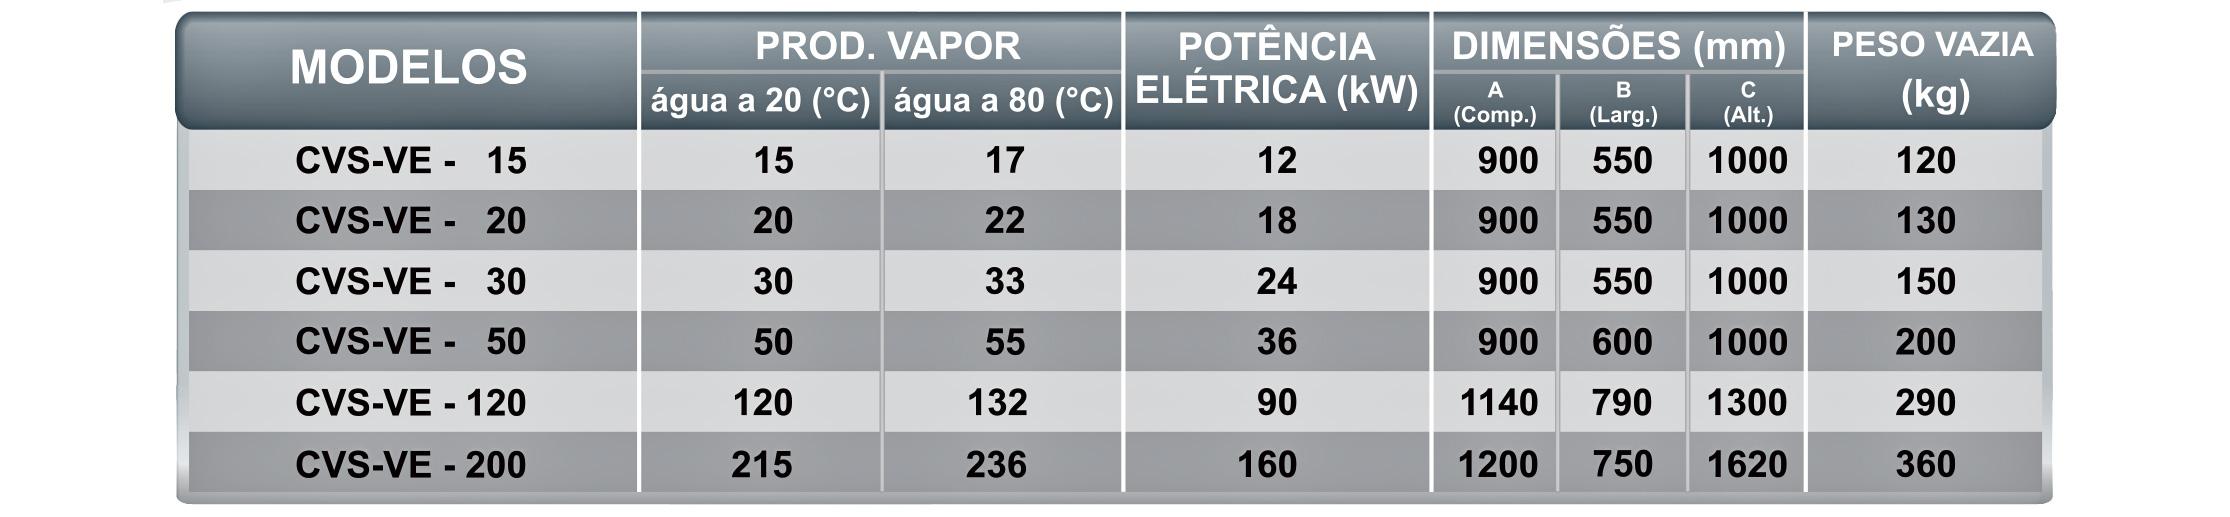 Dados Técnicos CVS-VE Icaterm